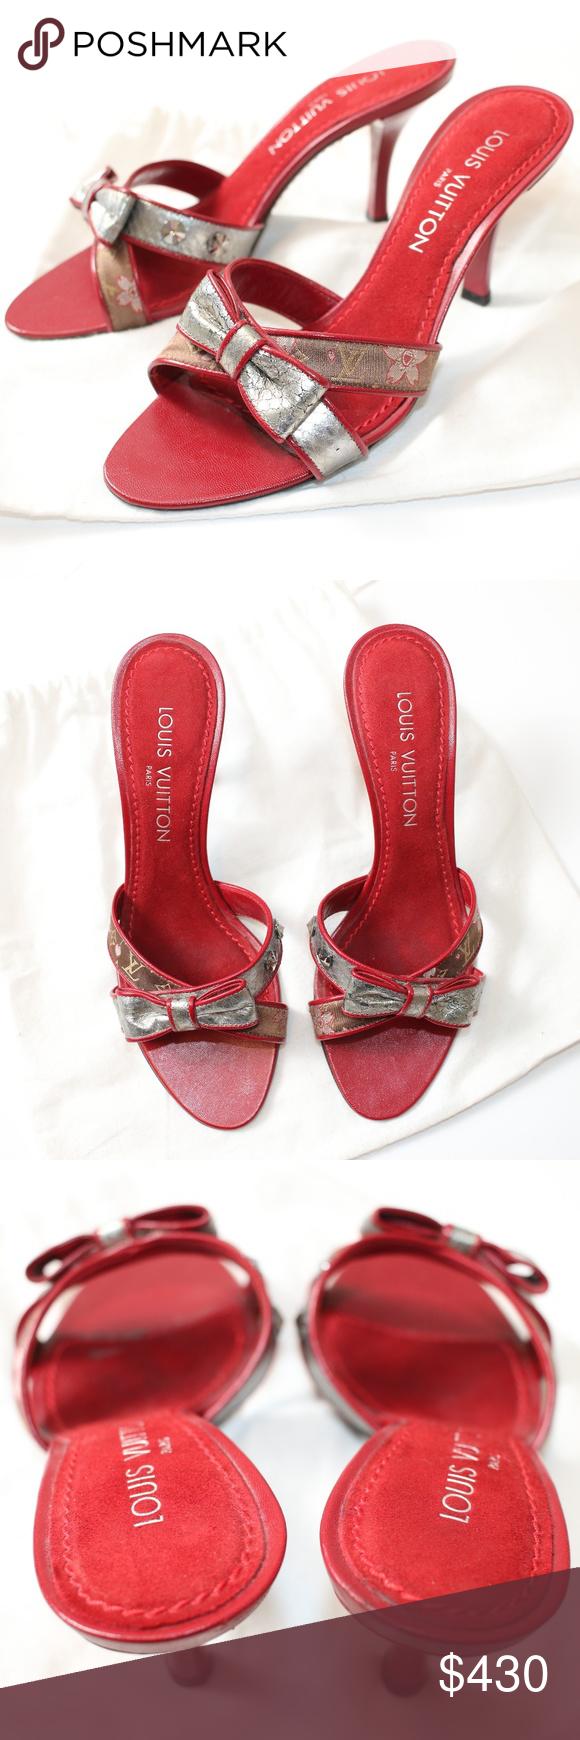 dc781808071e Louis Vuitton Red Satin Cherry Blossom Slide Heels Authentic Louis Vuitton  brown monogram satin silver snake